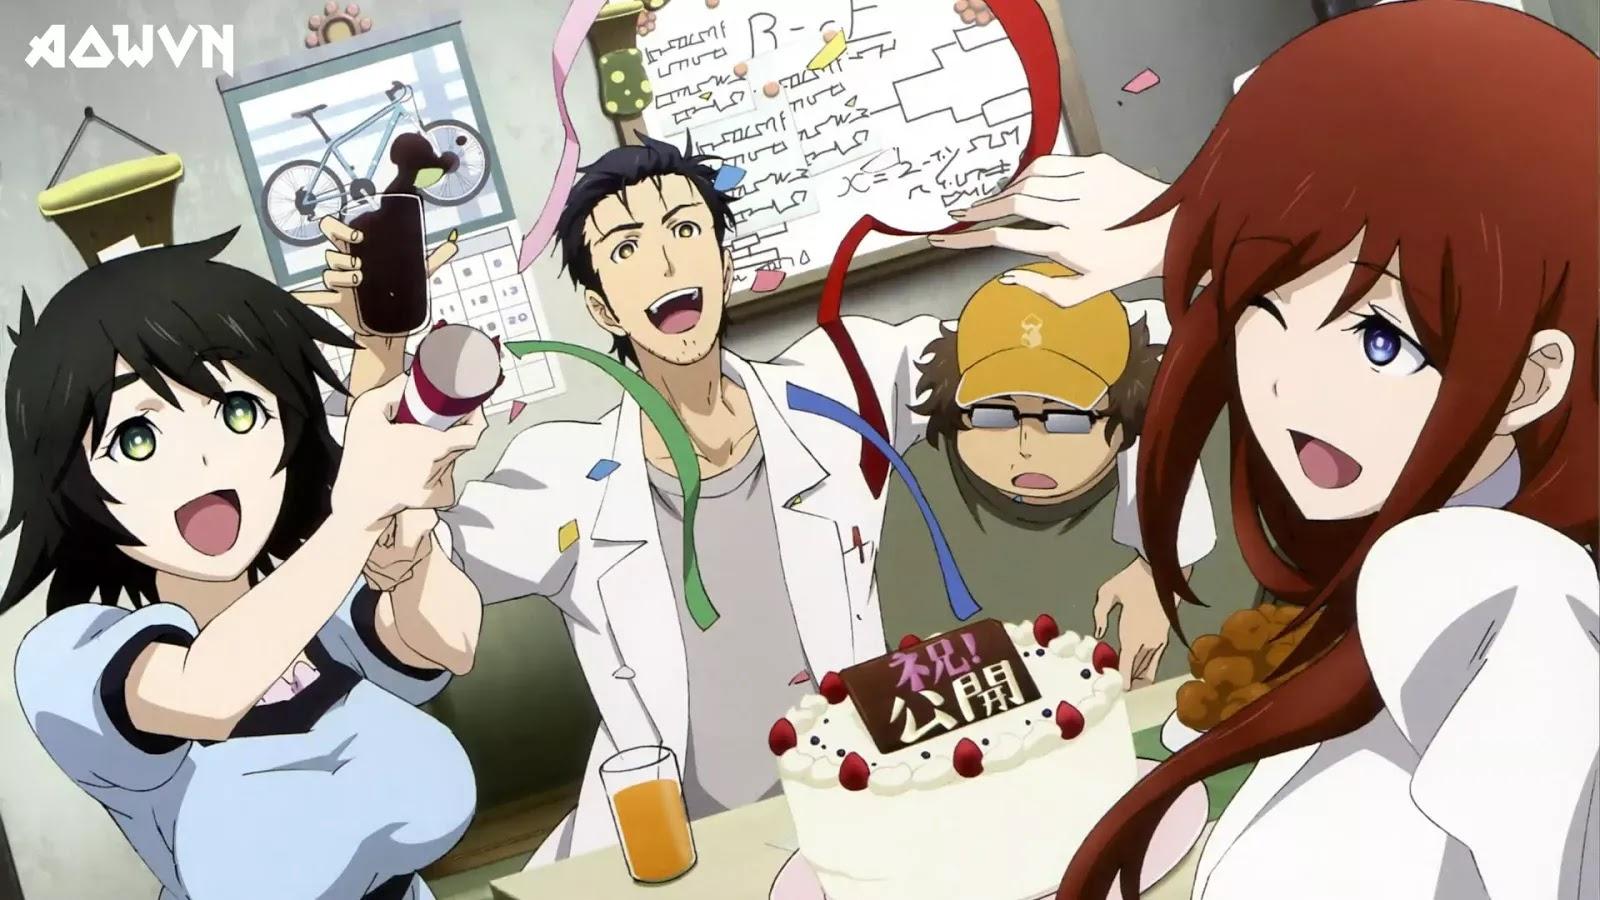 AowVN.org minz%2B%25283%2529 - [ Anime 3gp Mp4 ] Steins;Gate + Specials + Movie | Vietsub - Tuyệt Phẩm Cực Hay